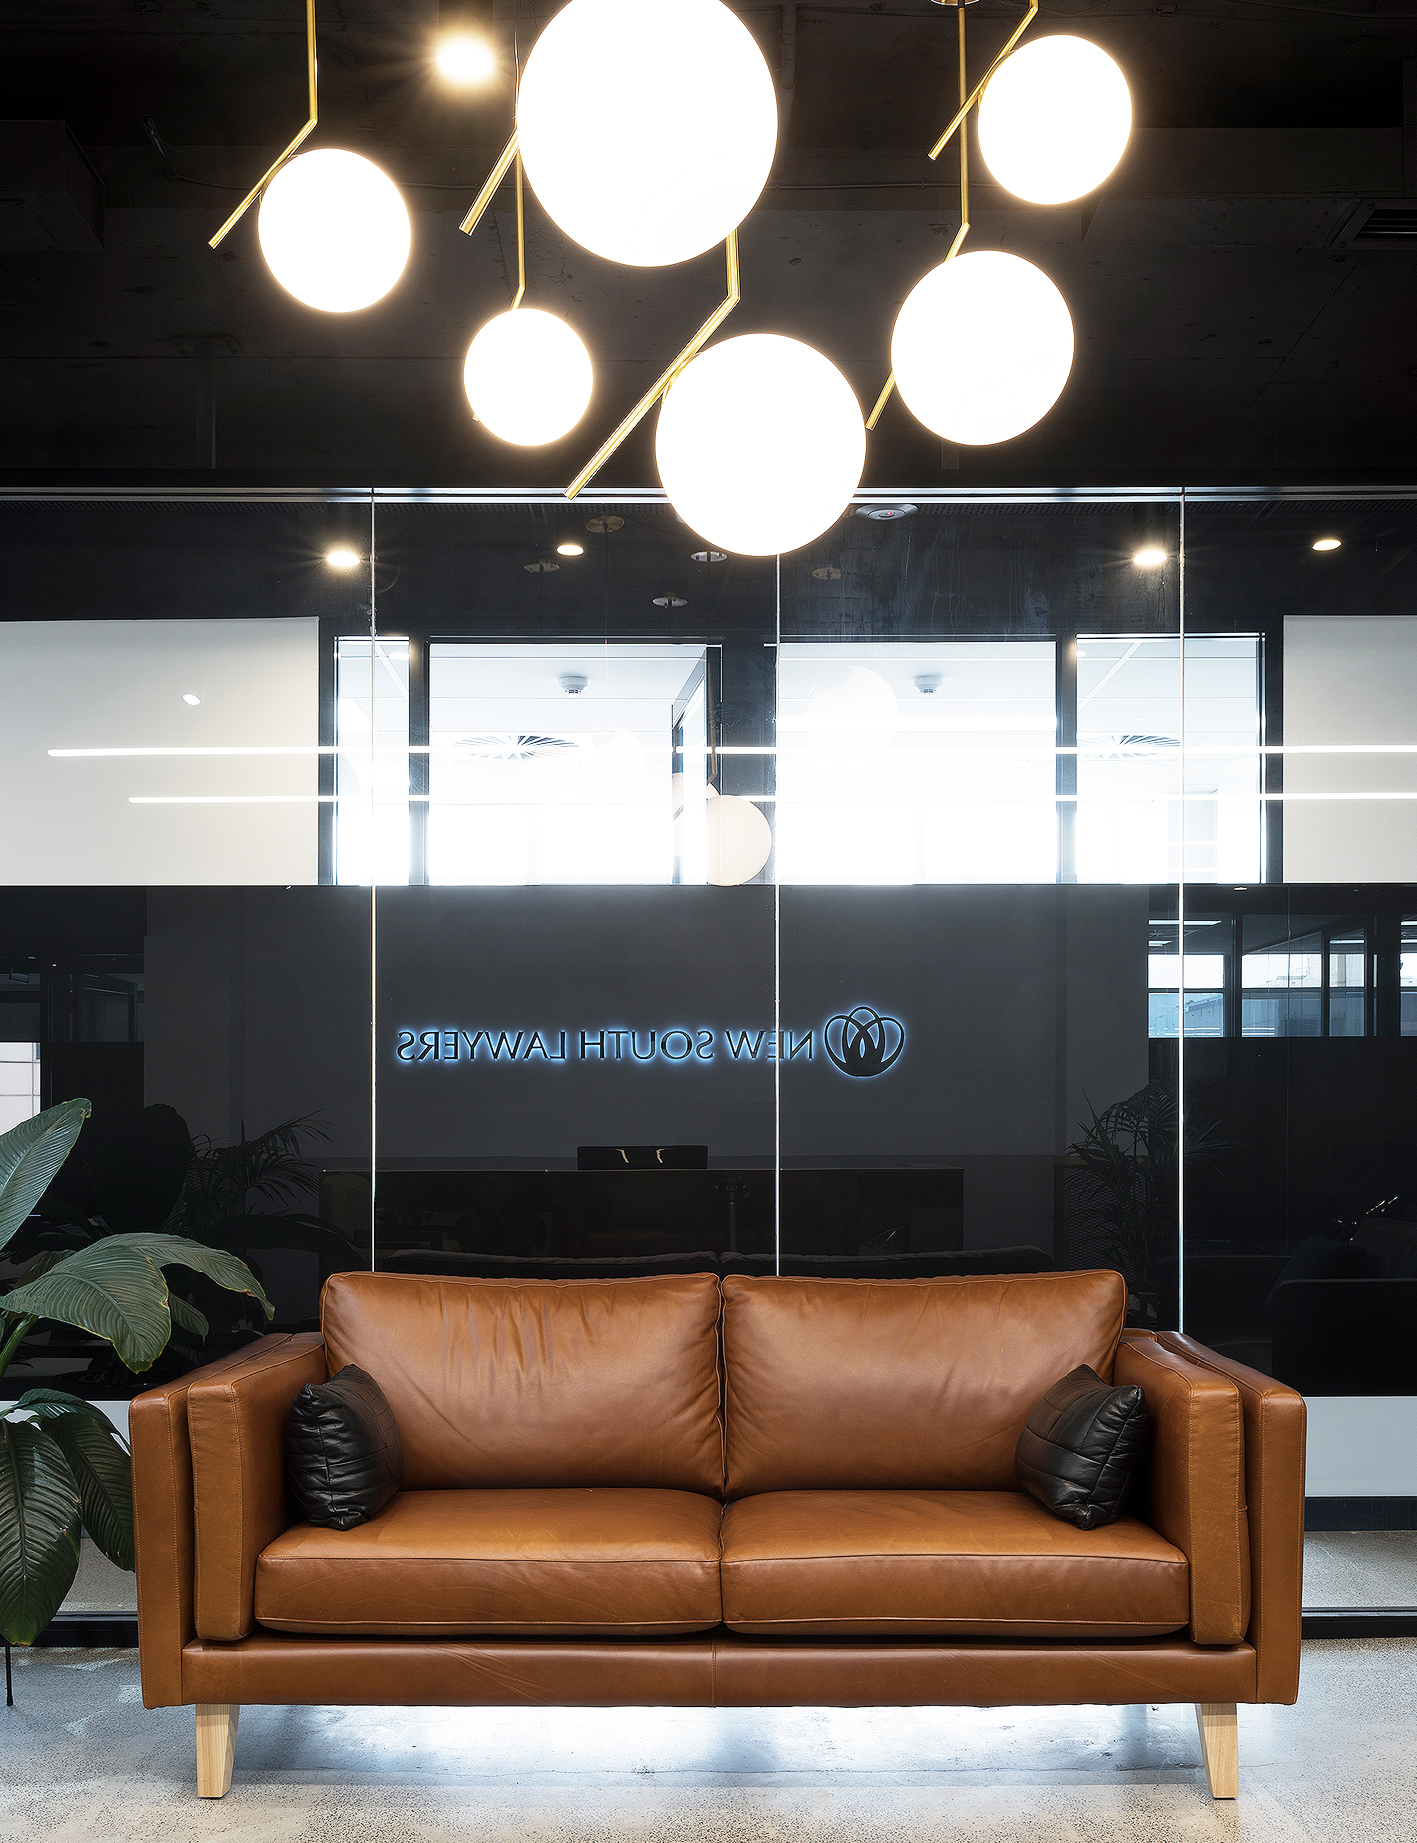 Cuir 2.5 seater – Custom designed / created lounge